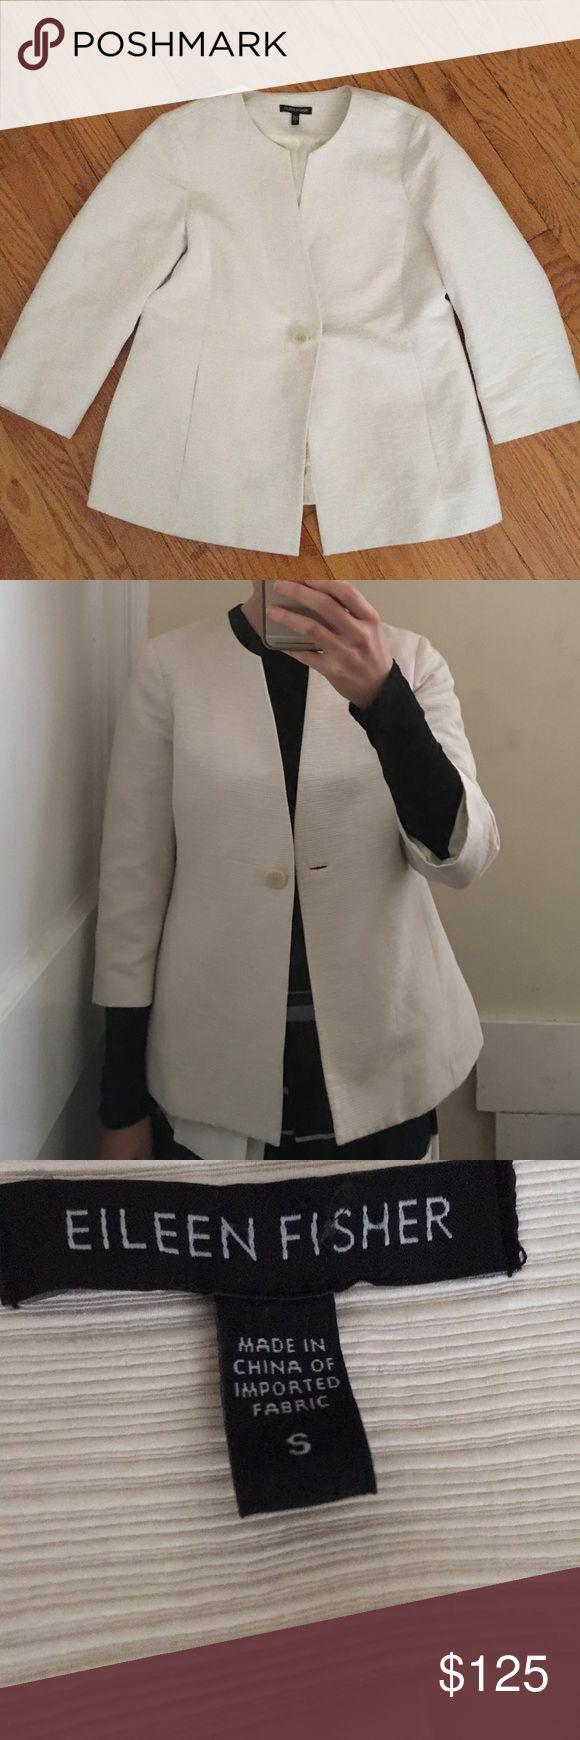 Eileen Fisher cream jacket Gorgeous! Cool oversized fit. Worn twice. Eileen Fisher Jackets & Coats